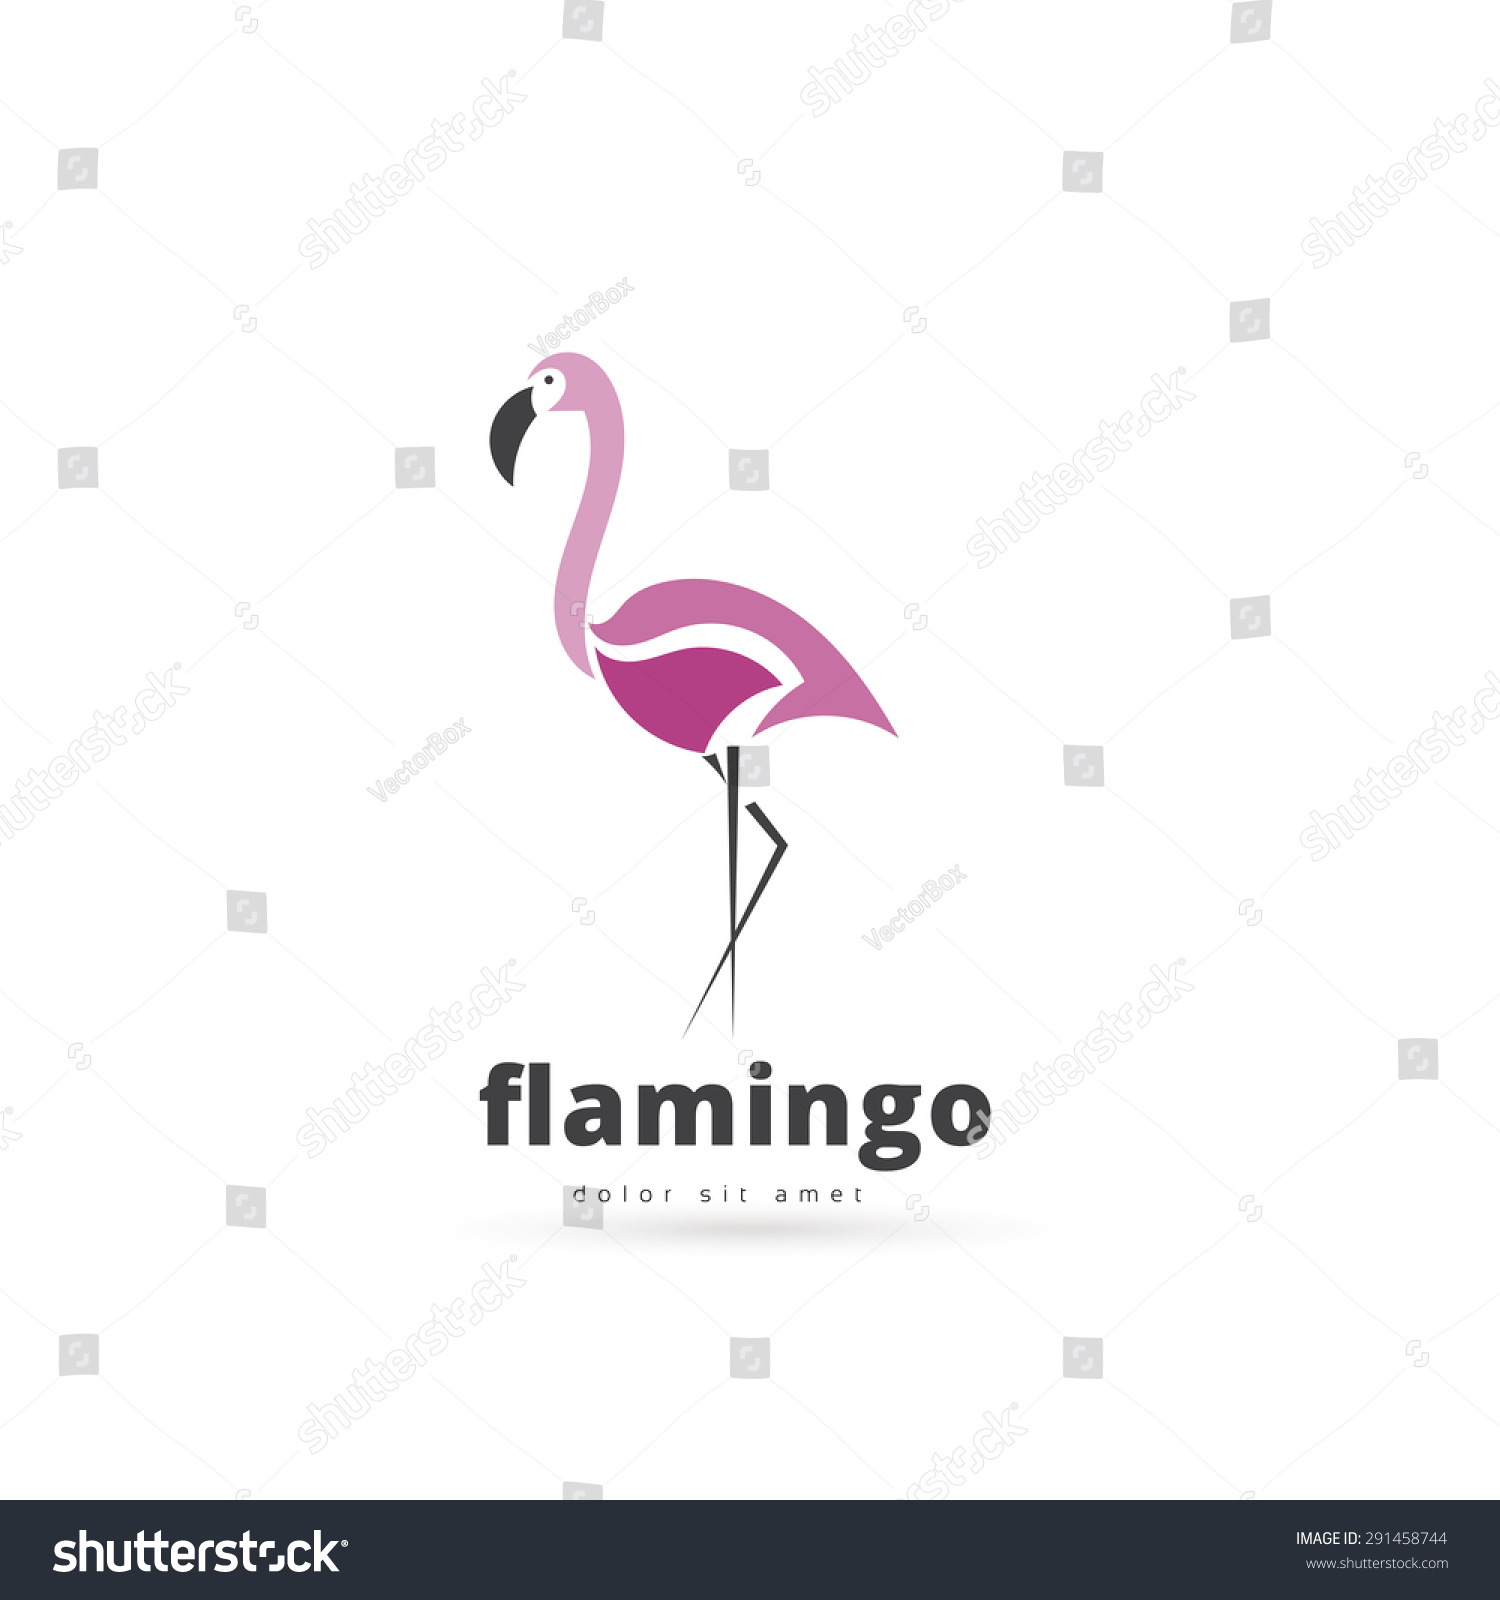 Artistic Stylized Flamingo Icon Silhouette Birds Stock ...